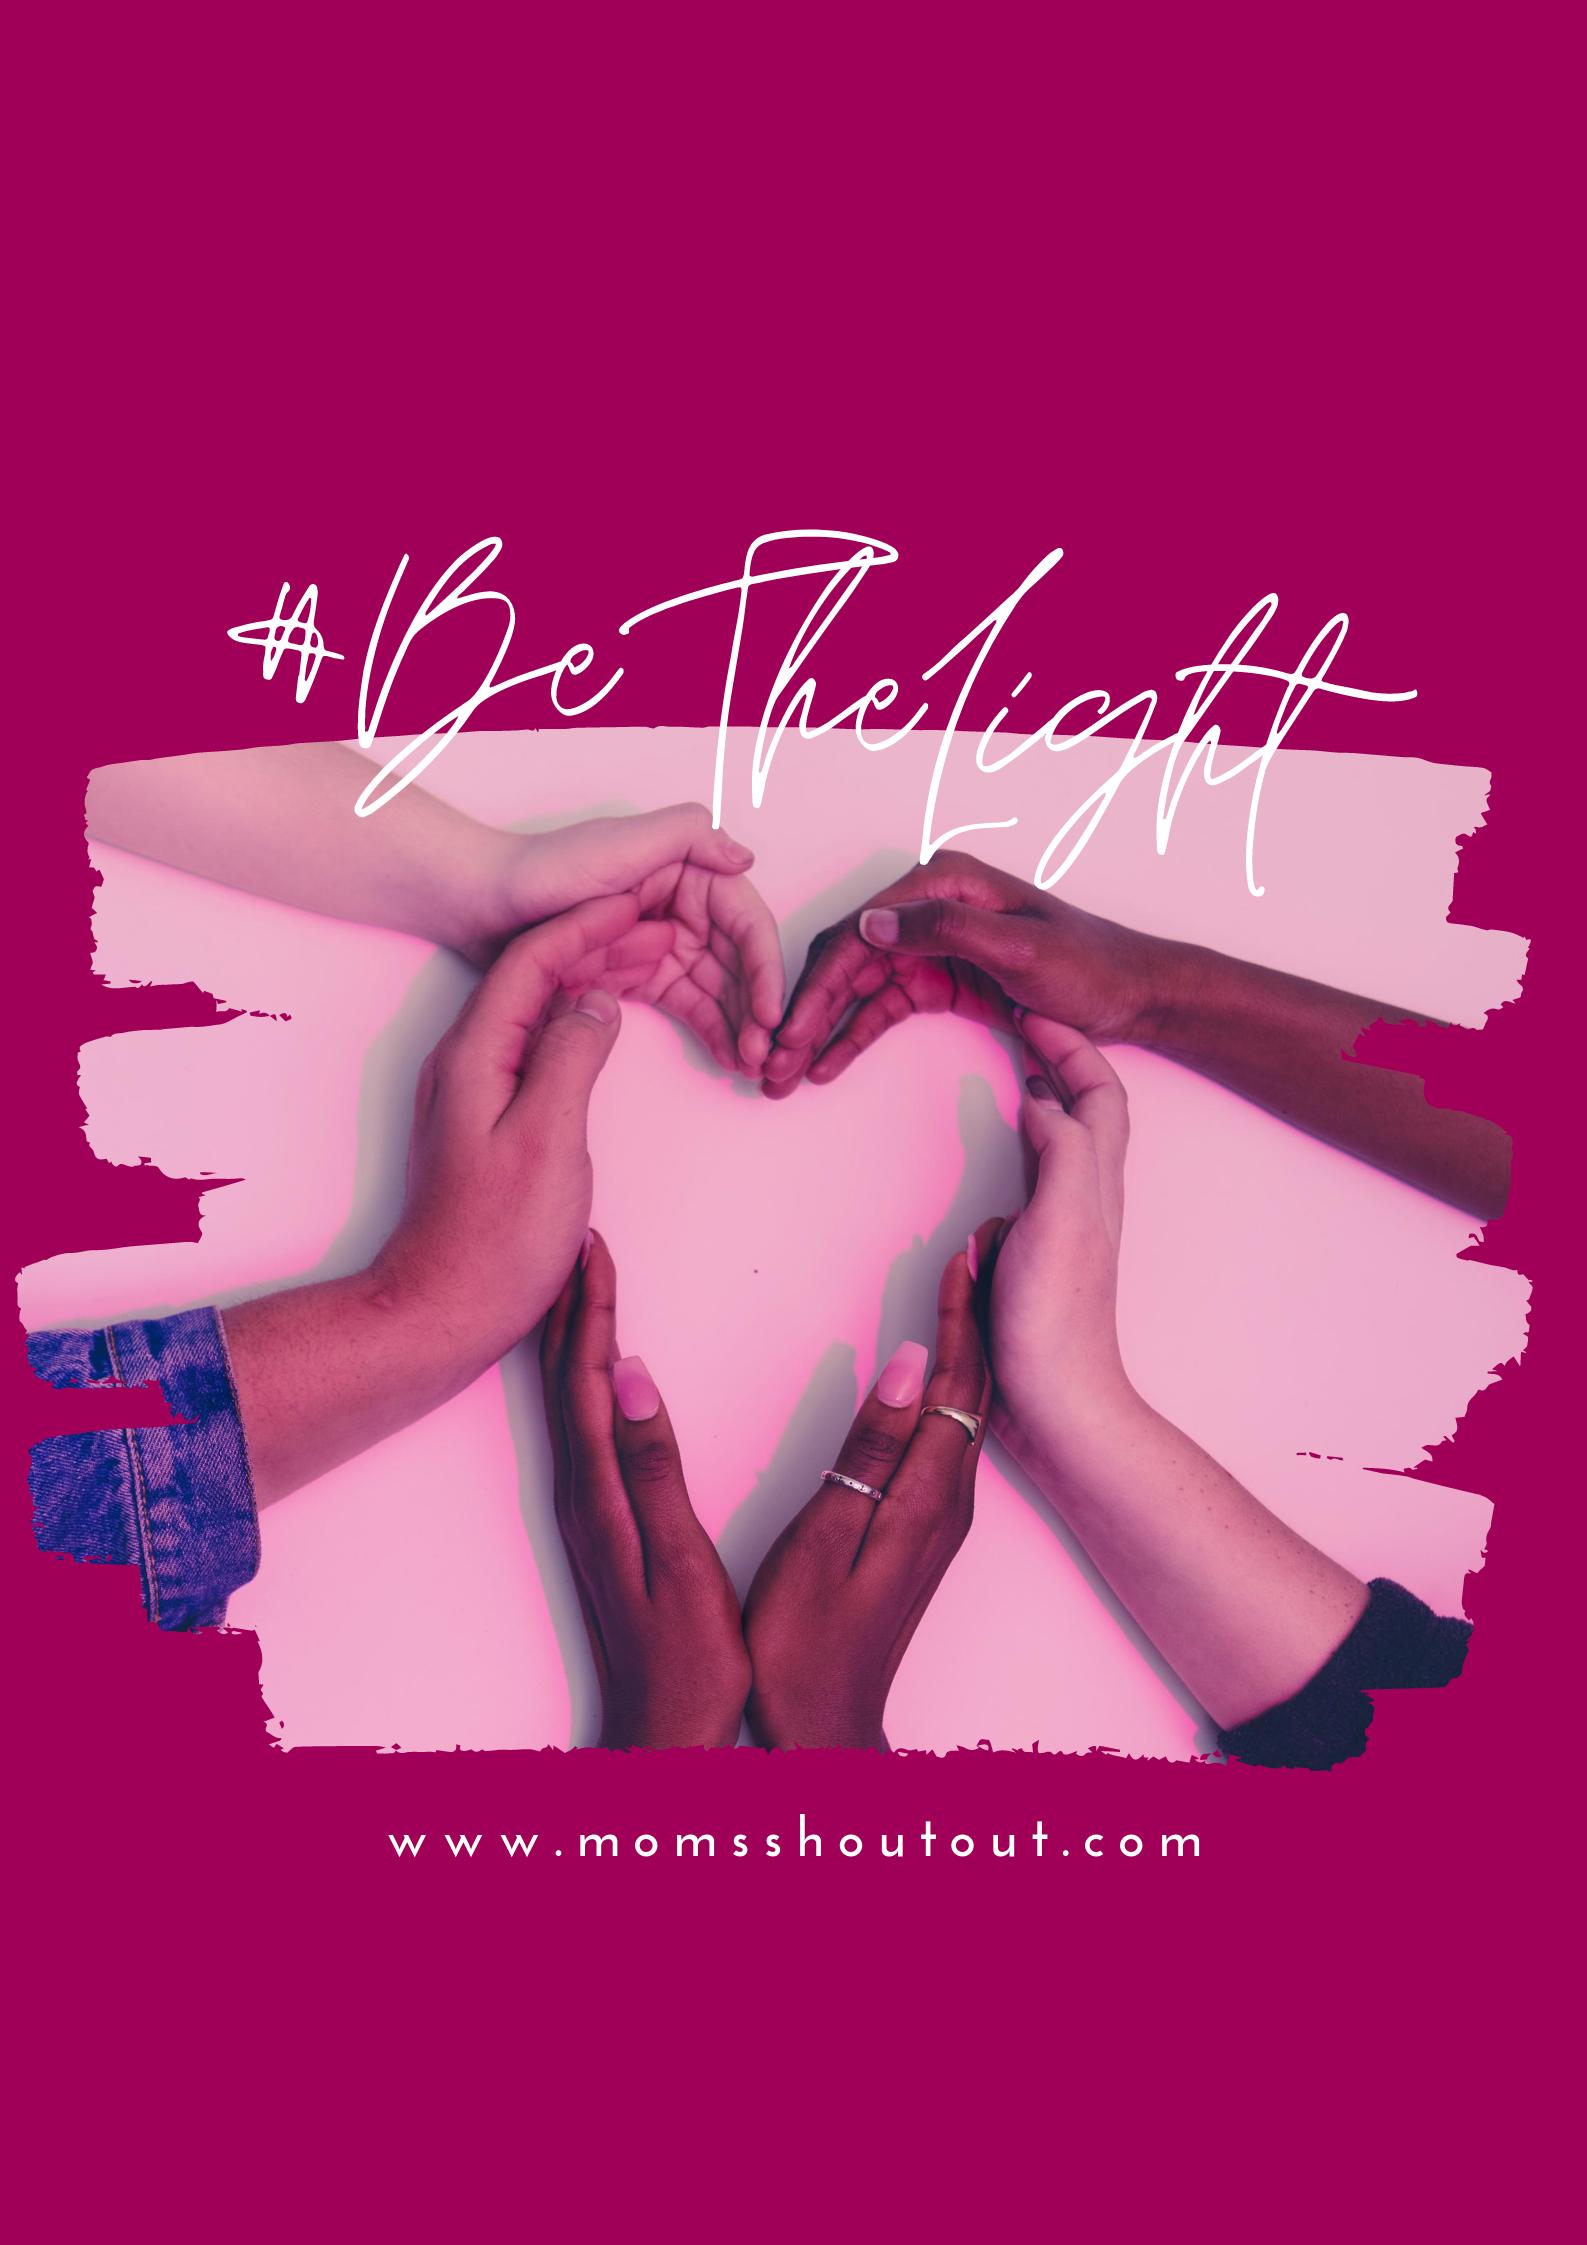 www.momsshoutout.com